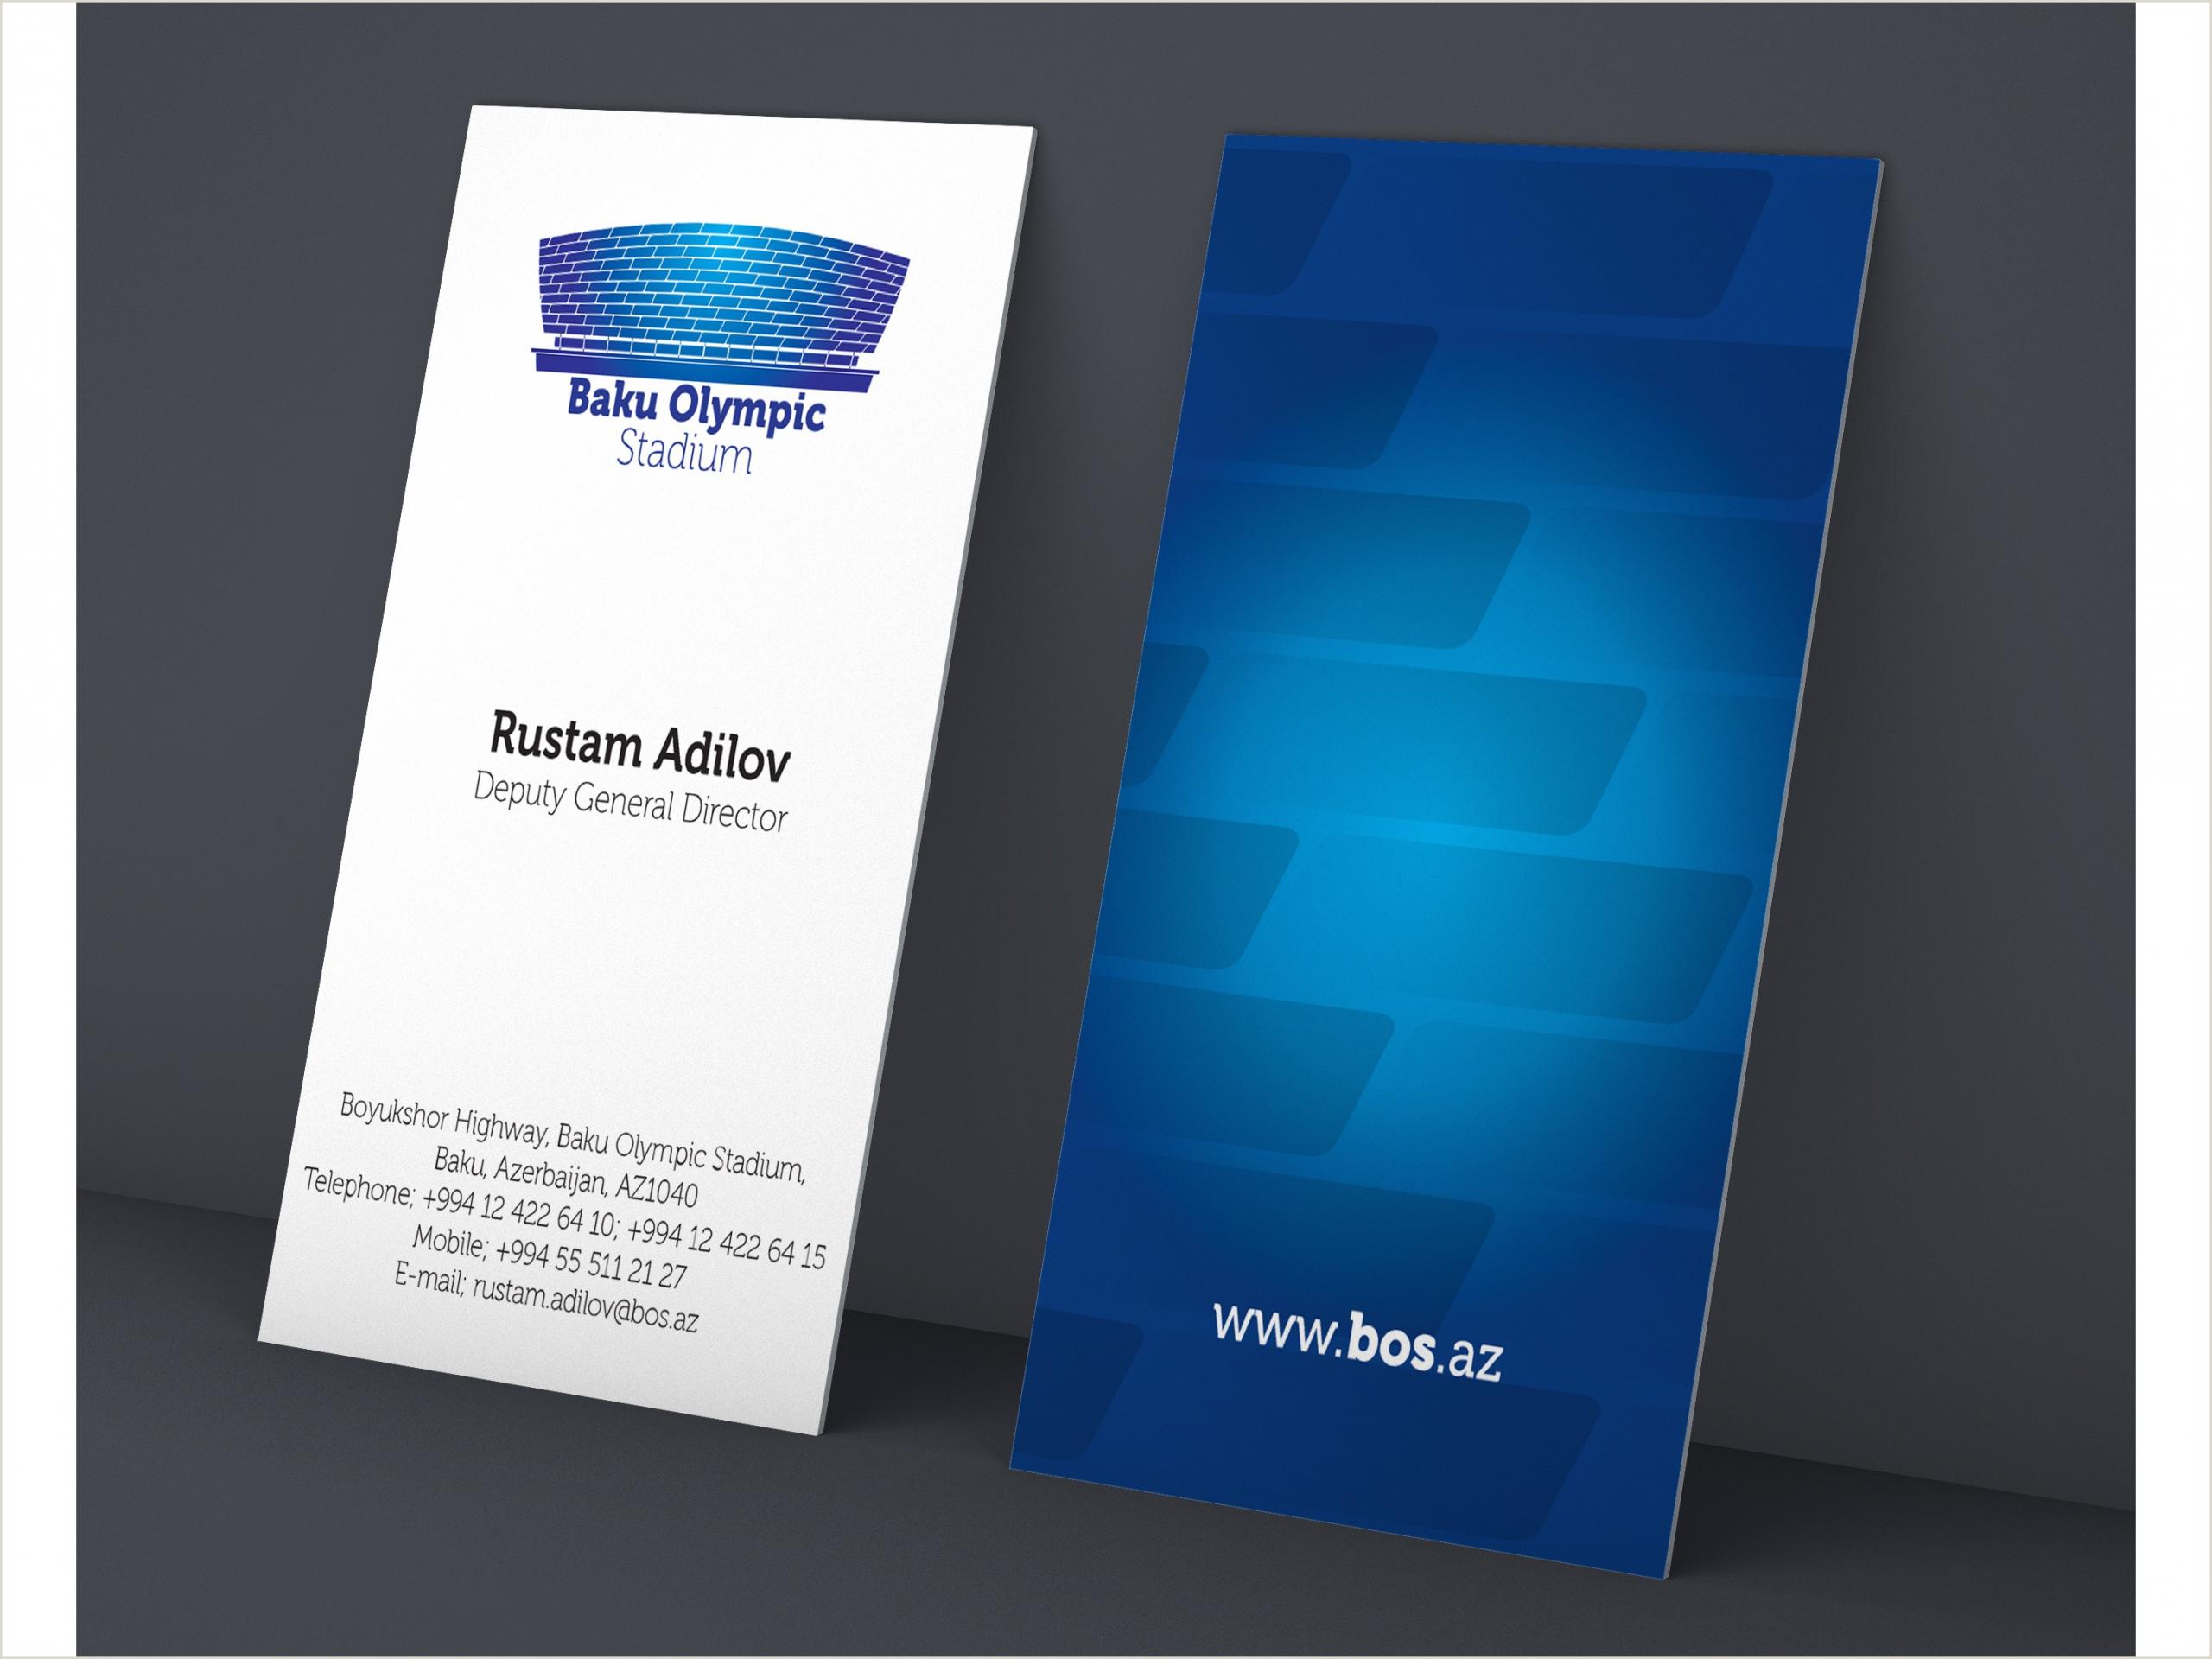 Visit Card Samples Visit Card Sample By Rustam Adilov On Dribbble